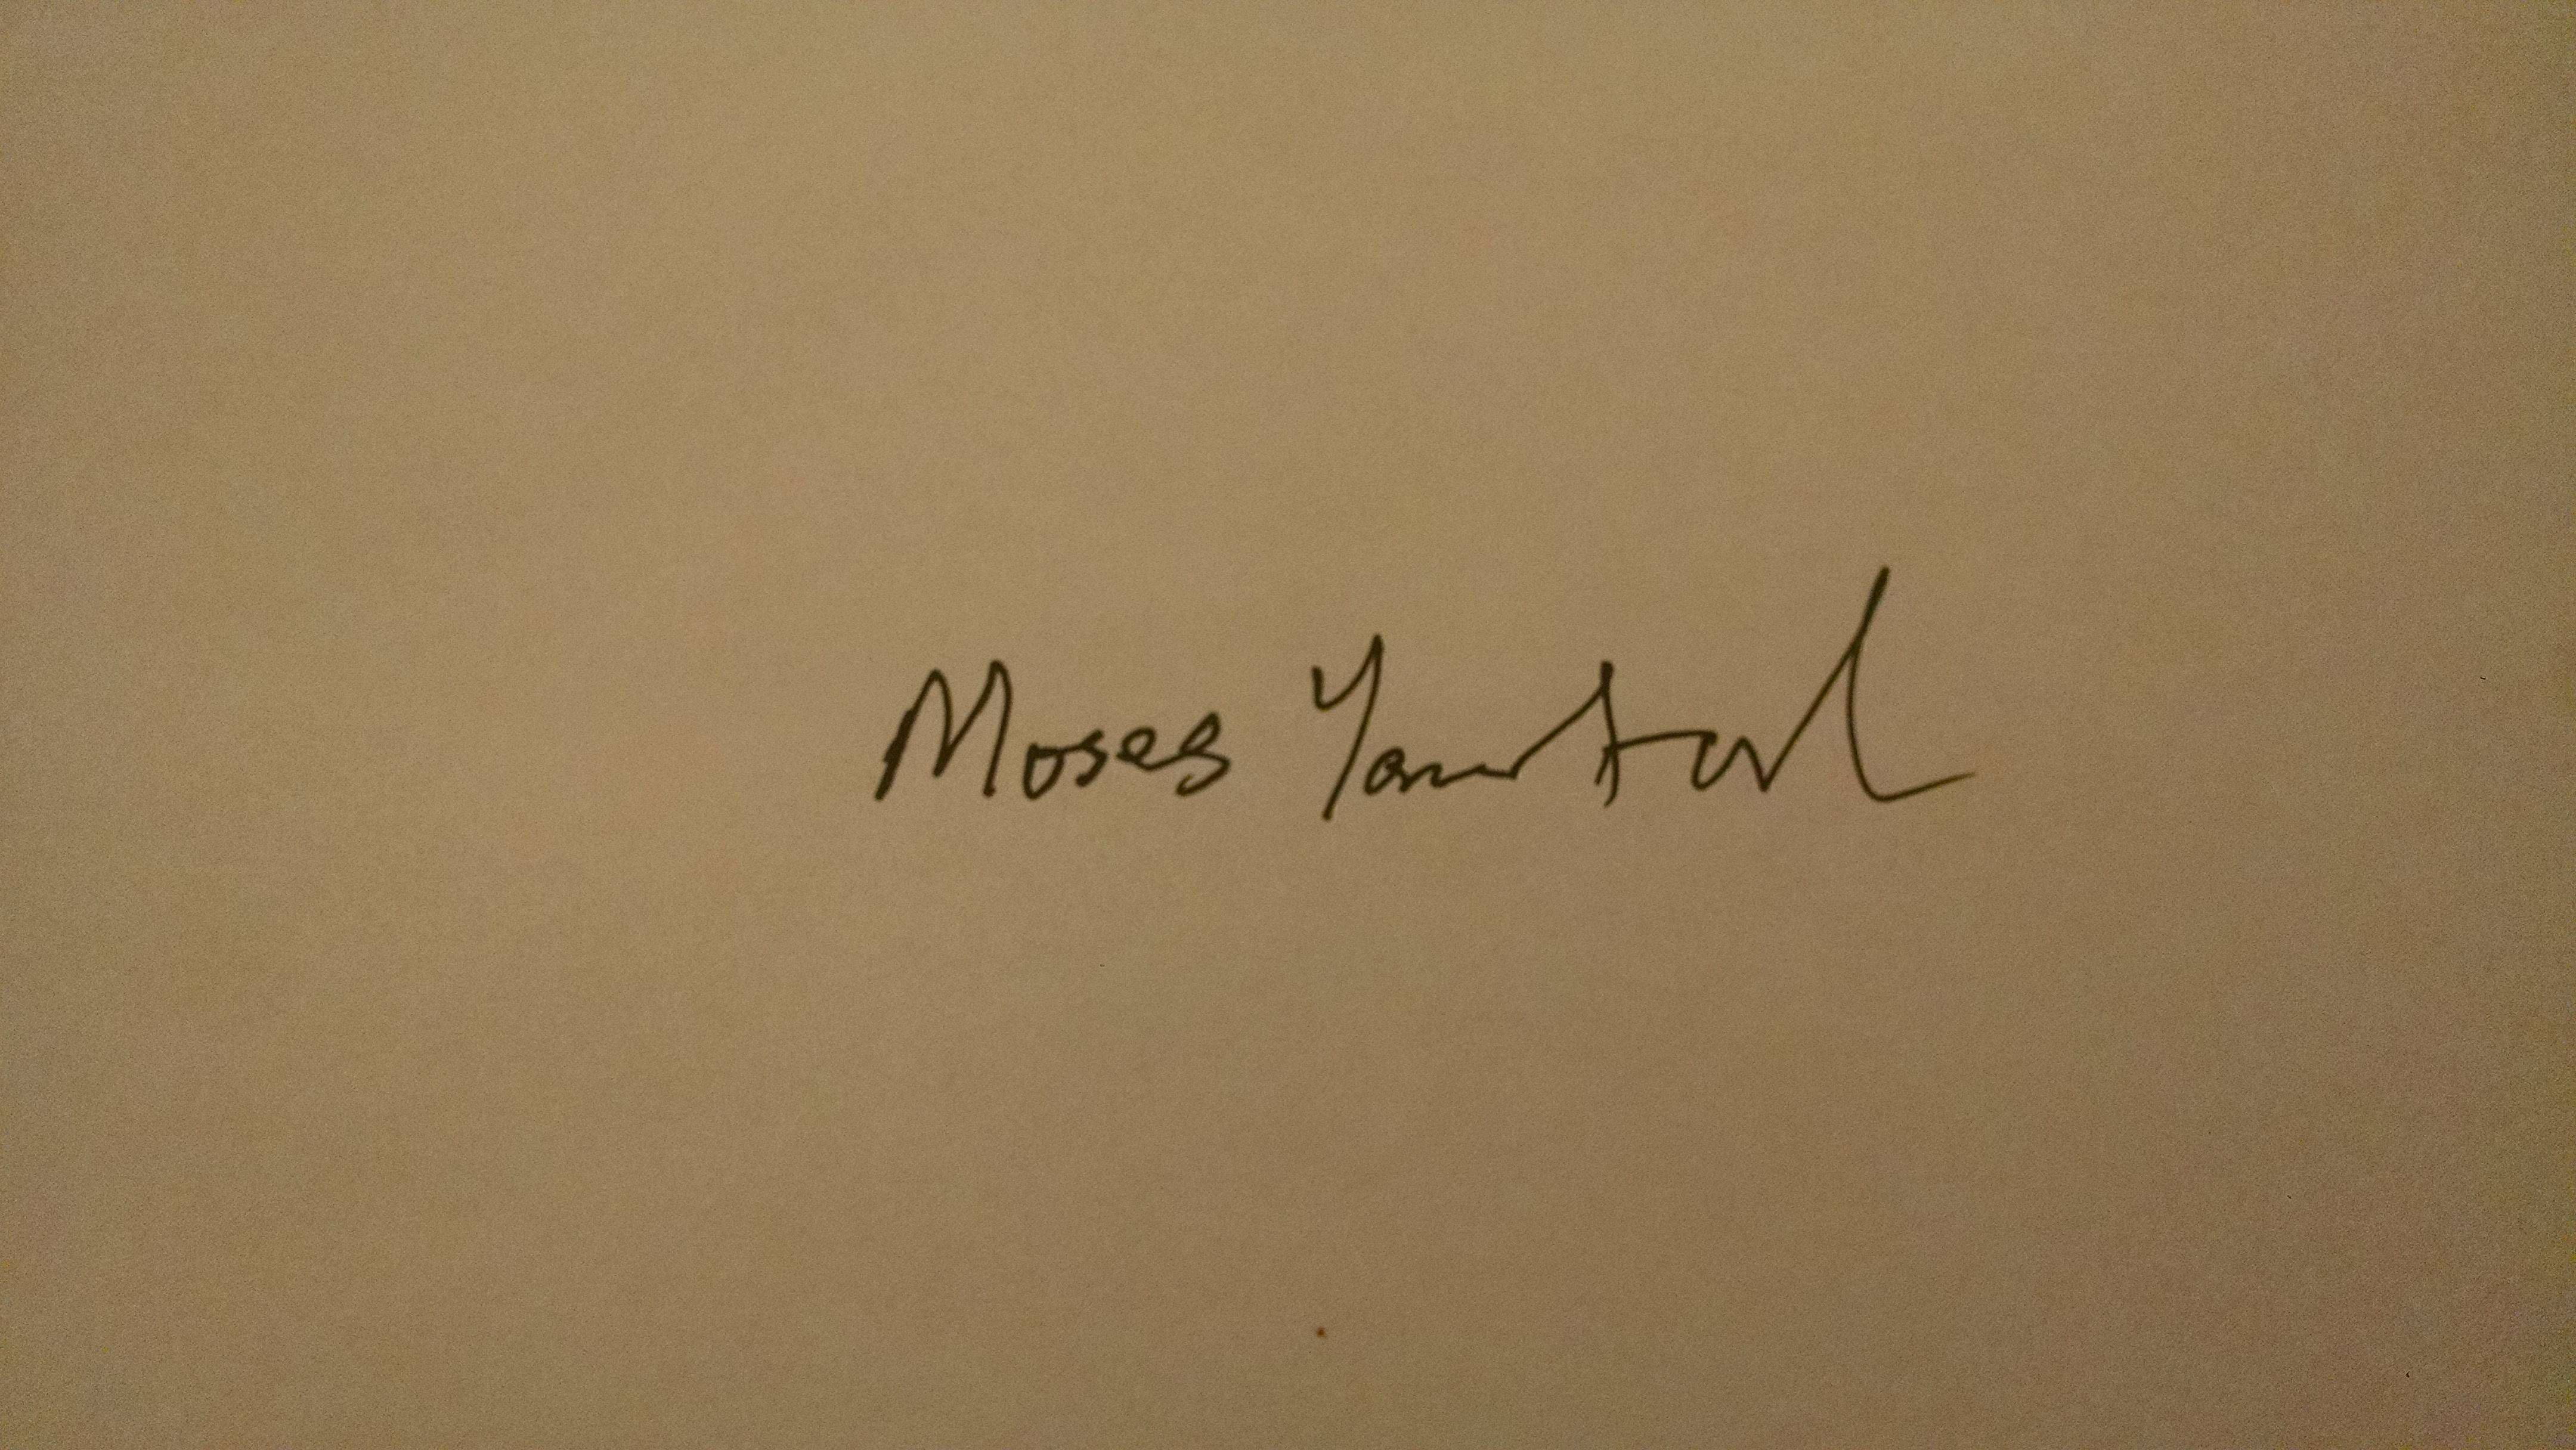 Moses Yamtal's Signature